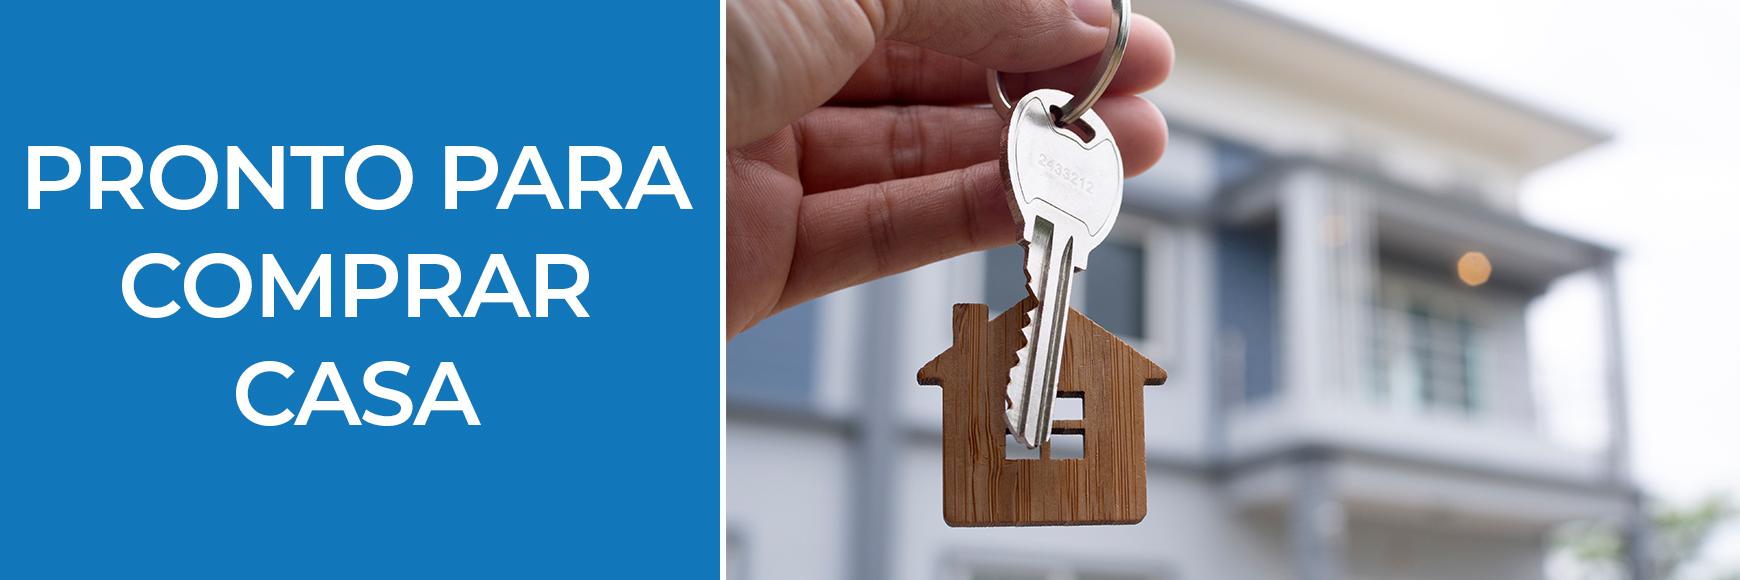 Pronto para comprar casa-Banner-Orlando Realtor Solutions